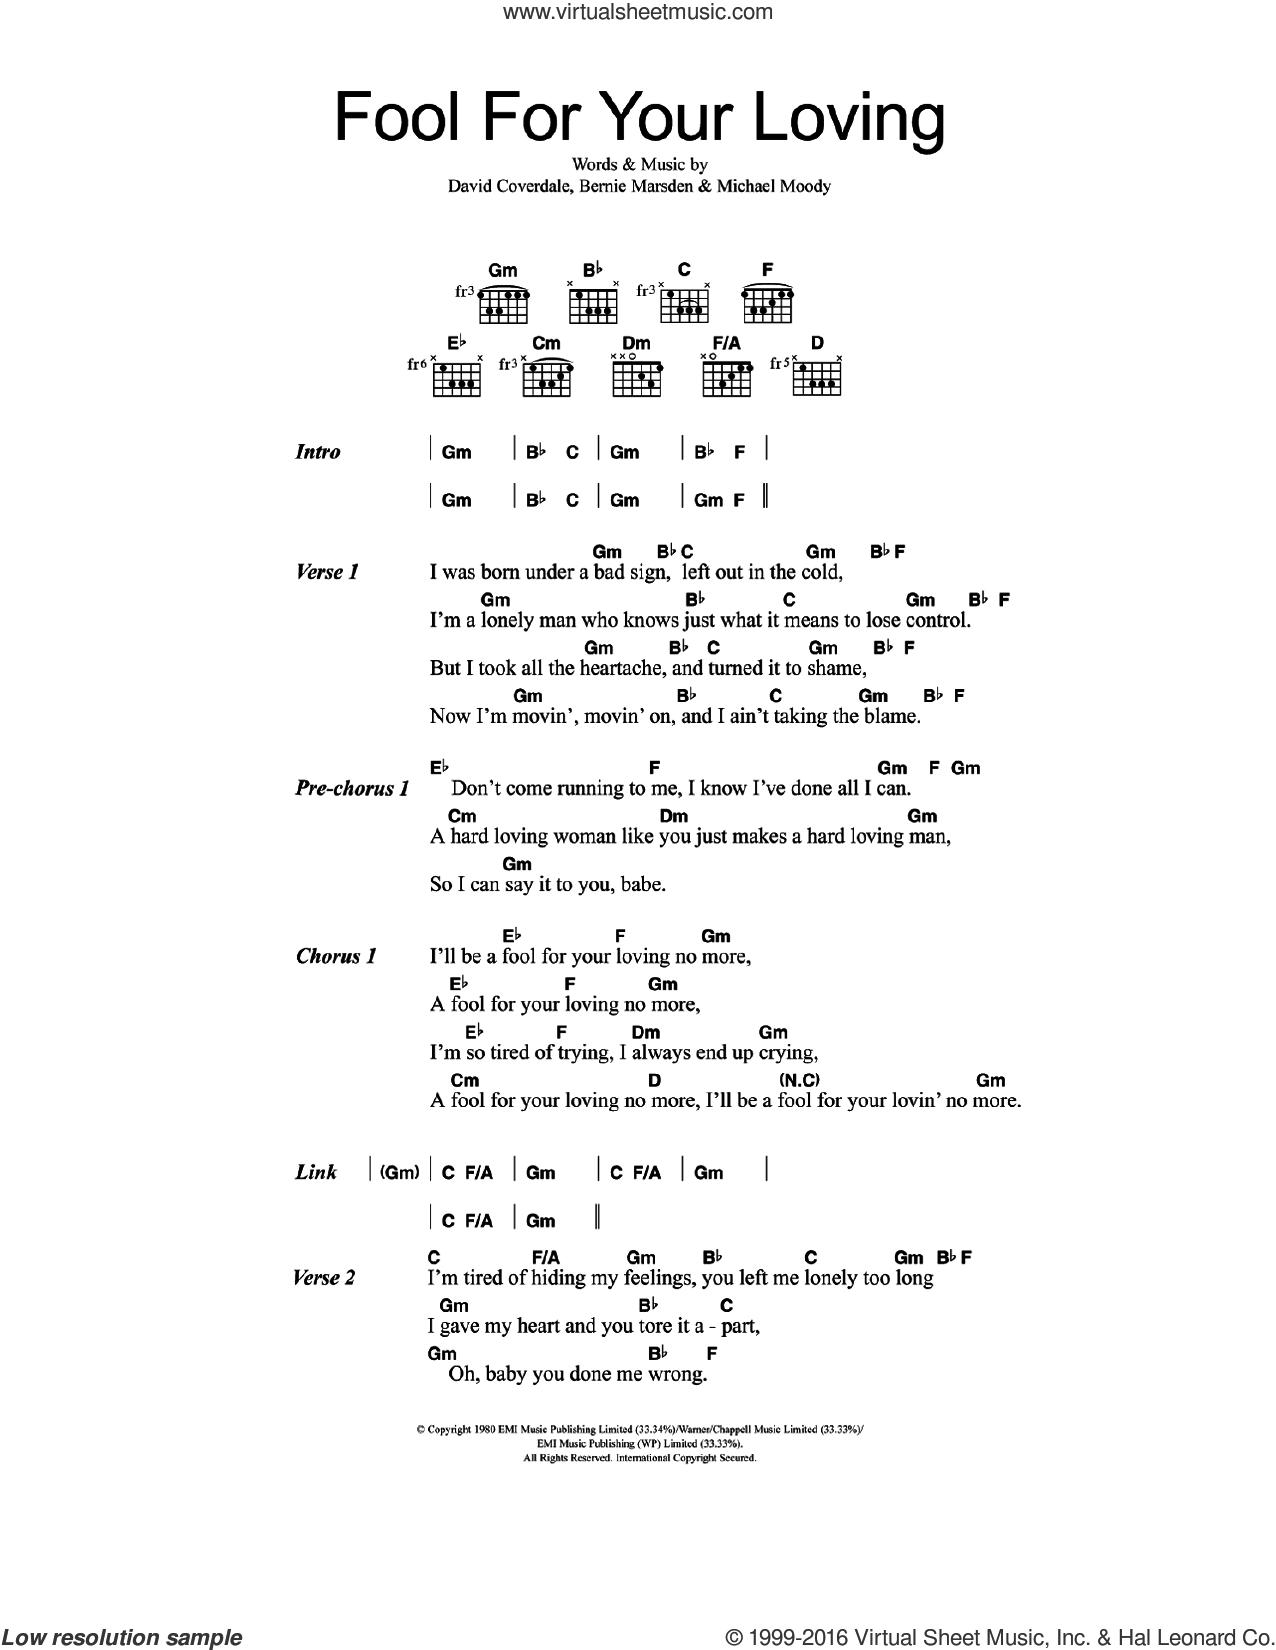 Fool For Your Loving sheet music for guitar (chords) by Whitesnake, Bernie Marsden, David Coverdale and Michael Moody, intermediate skill level